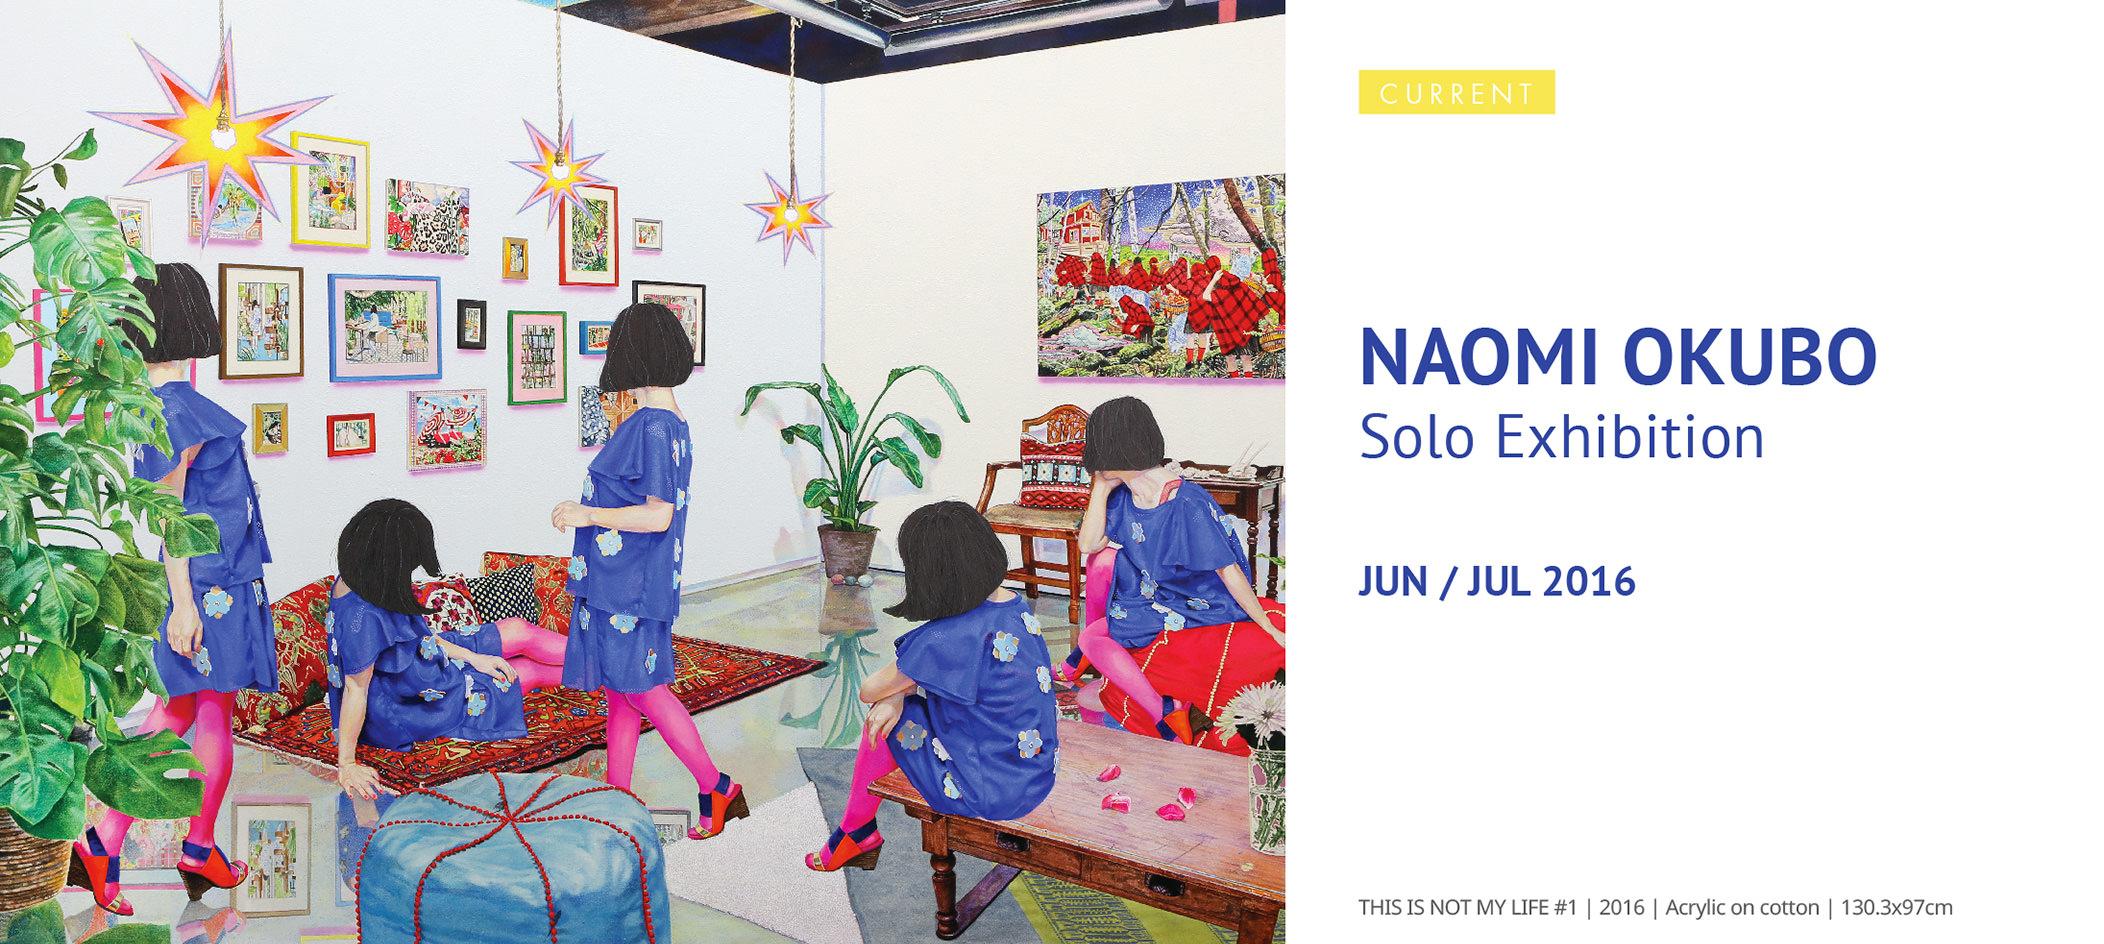 Naomi-Okubo-Solo-Exhibition